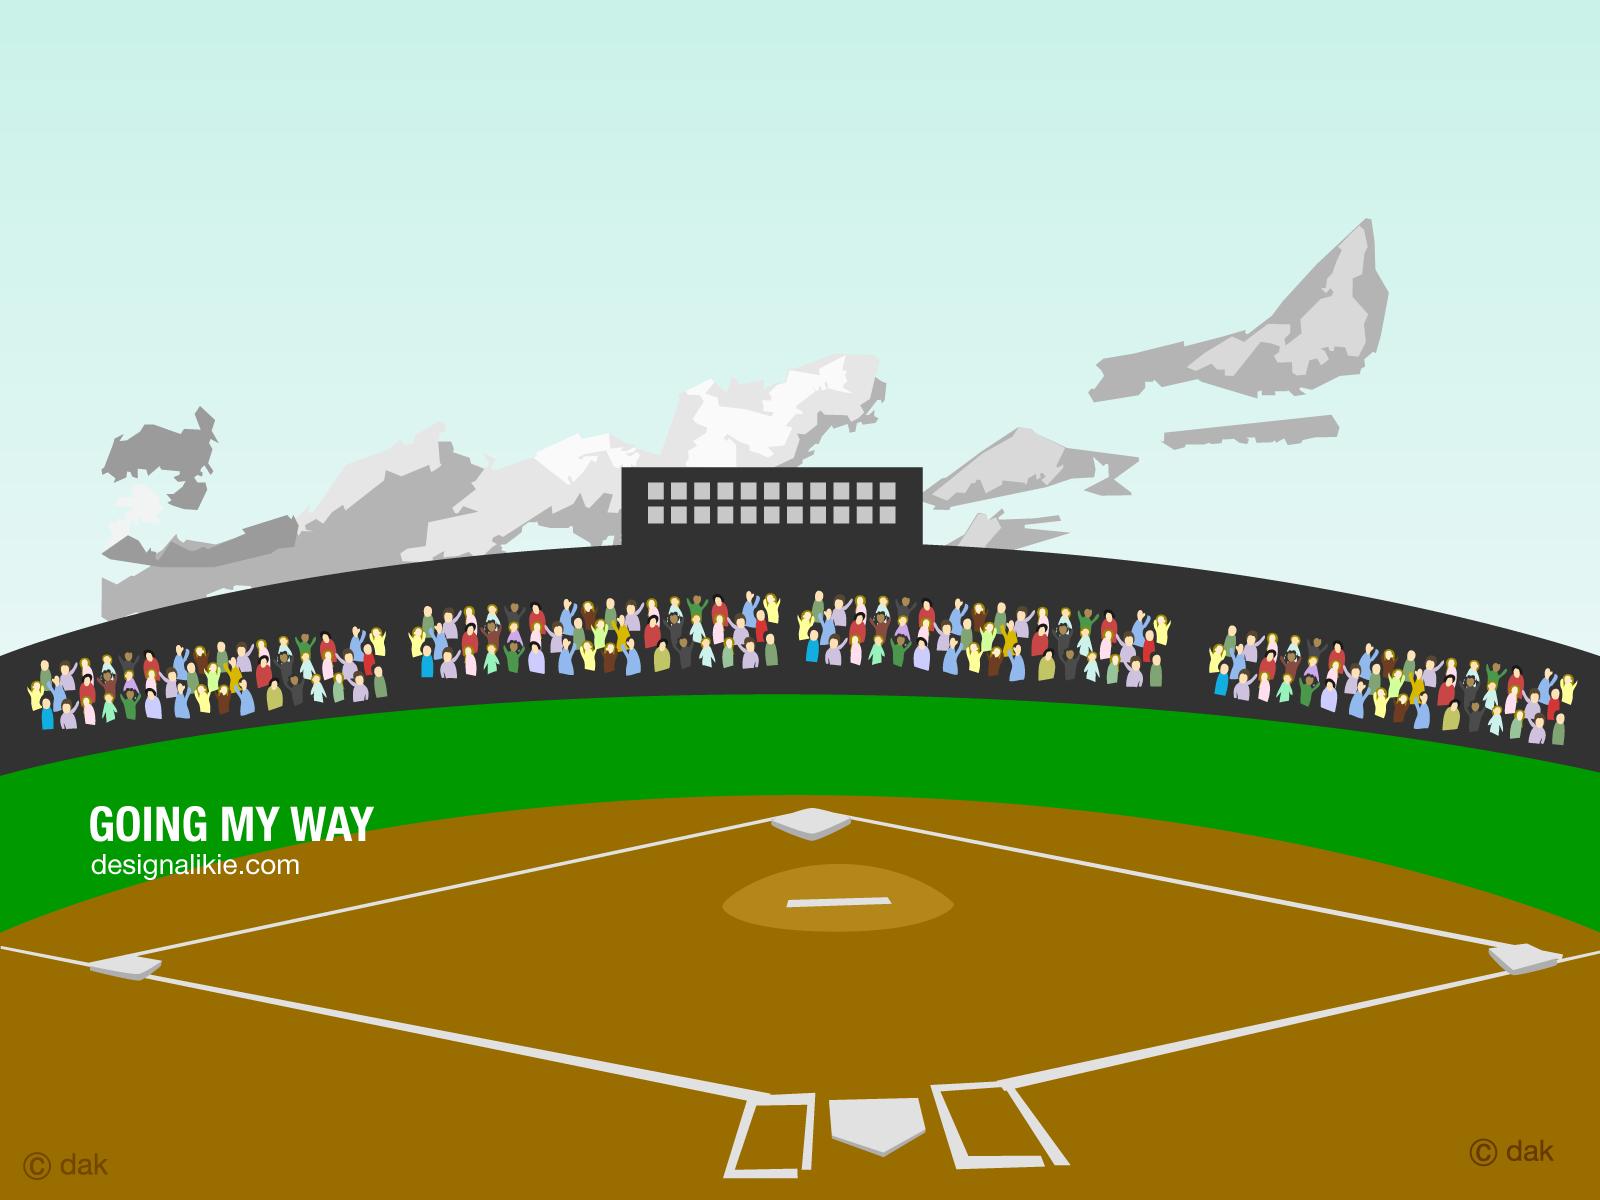 Light clipart baseball stadium Images collection clip Baseball clipart